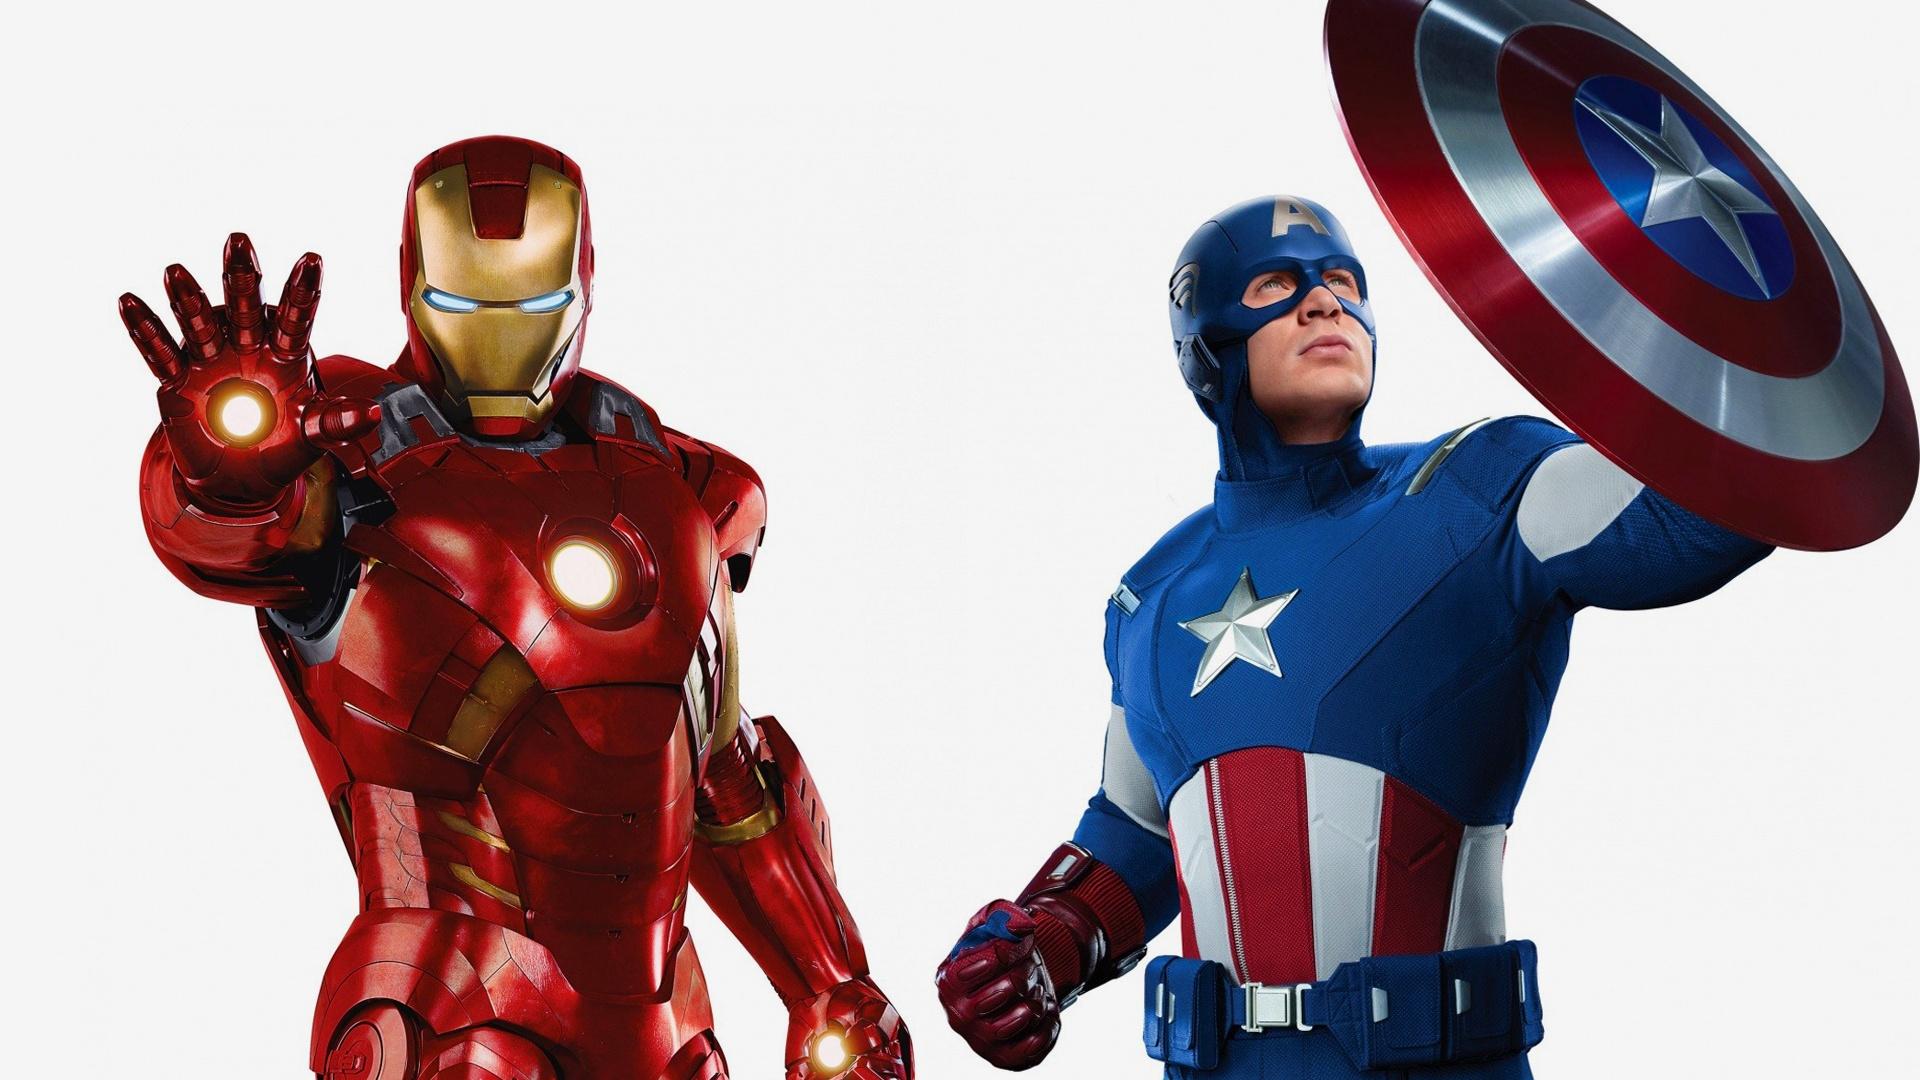 The Avengers Iron Man Captain America 1920x1200 Hd